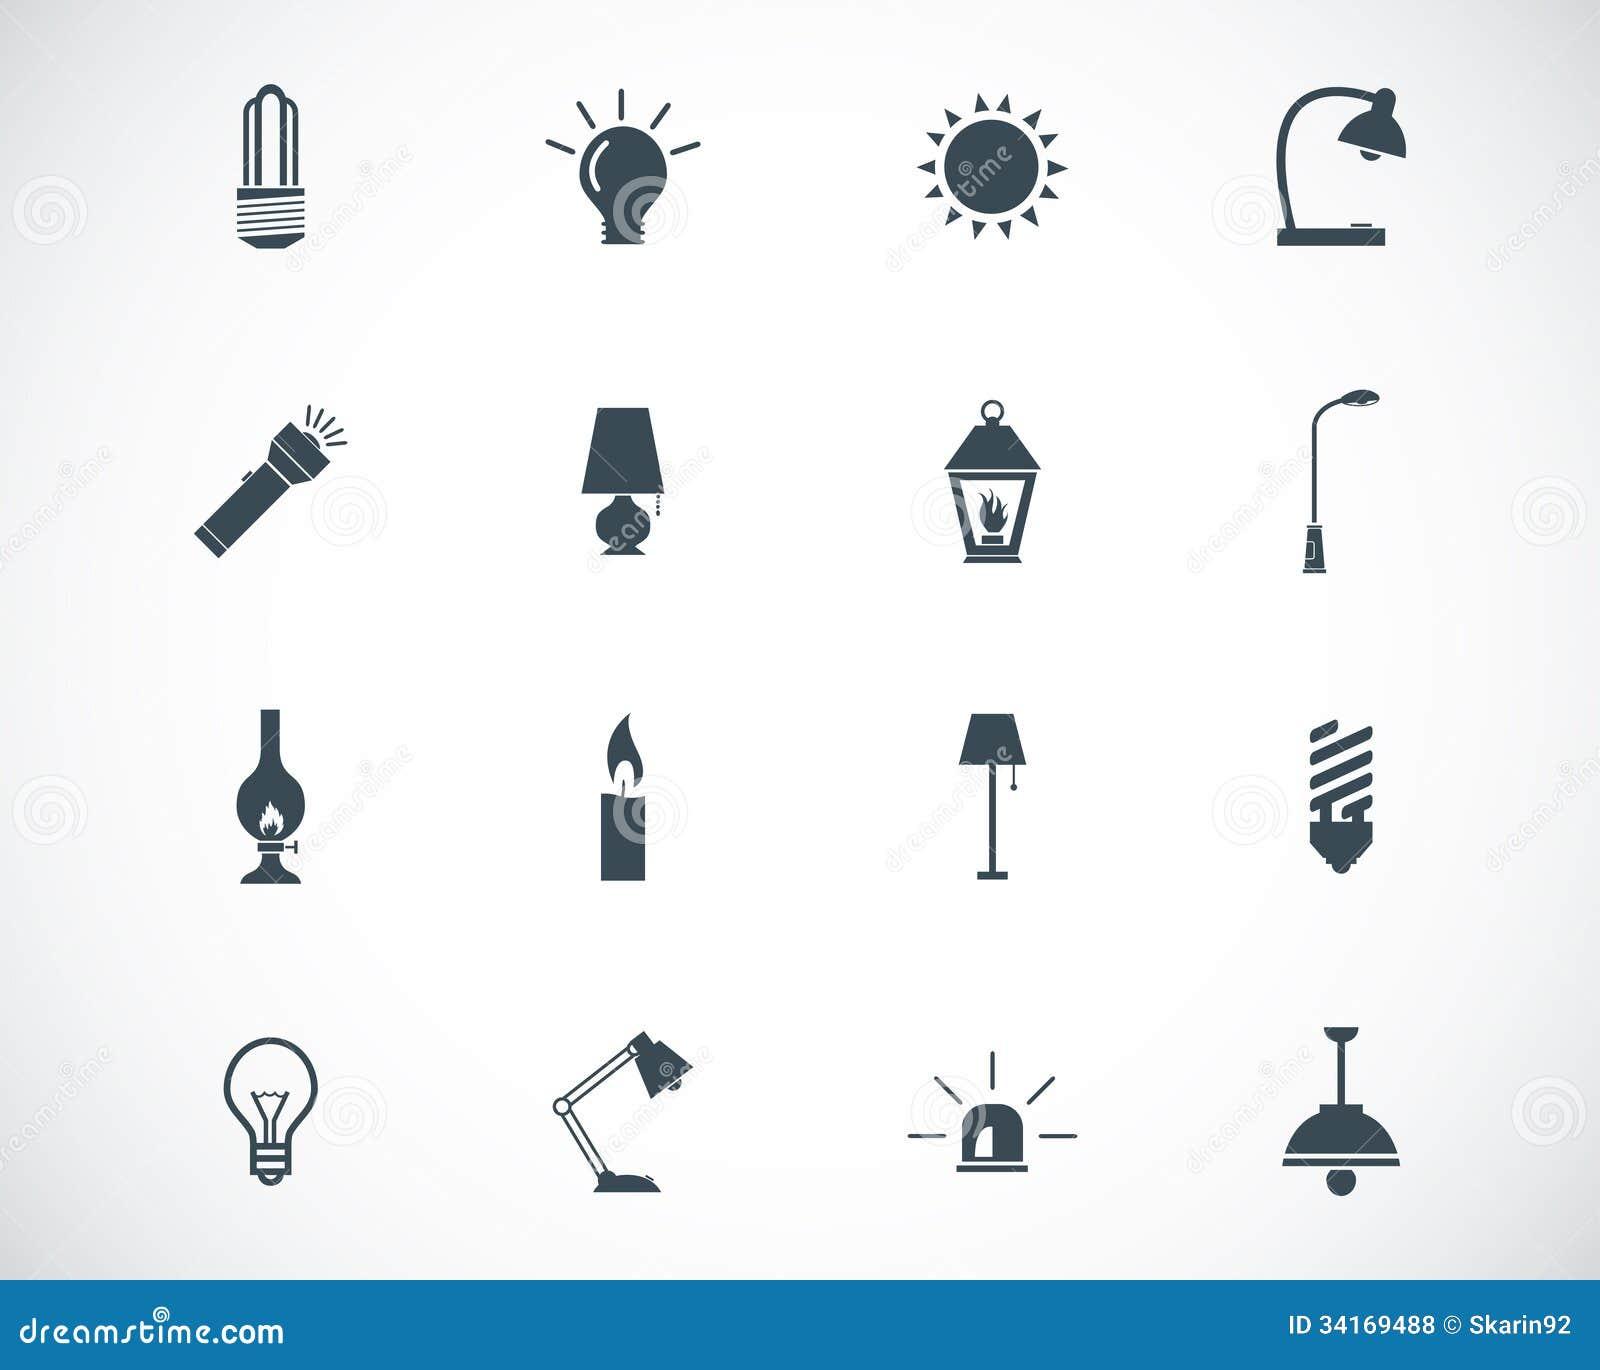 icon lighting. black icons light icon lighting